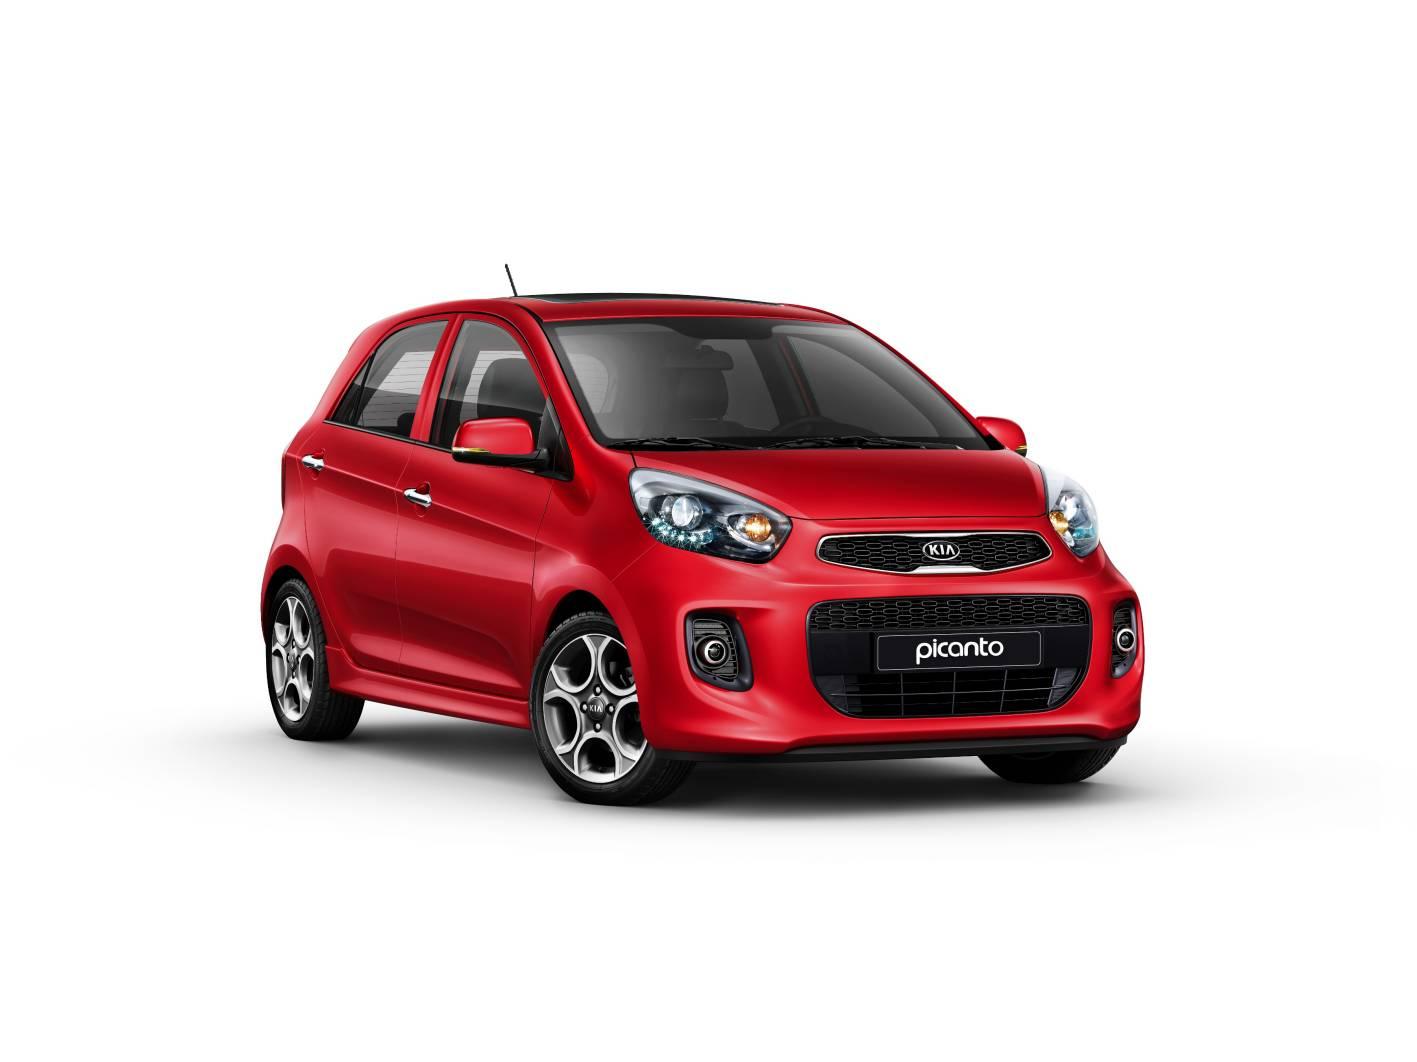 Image Result For Smart Insurance Kia